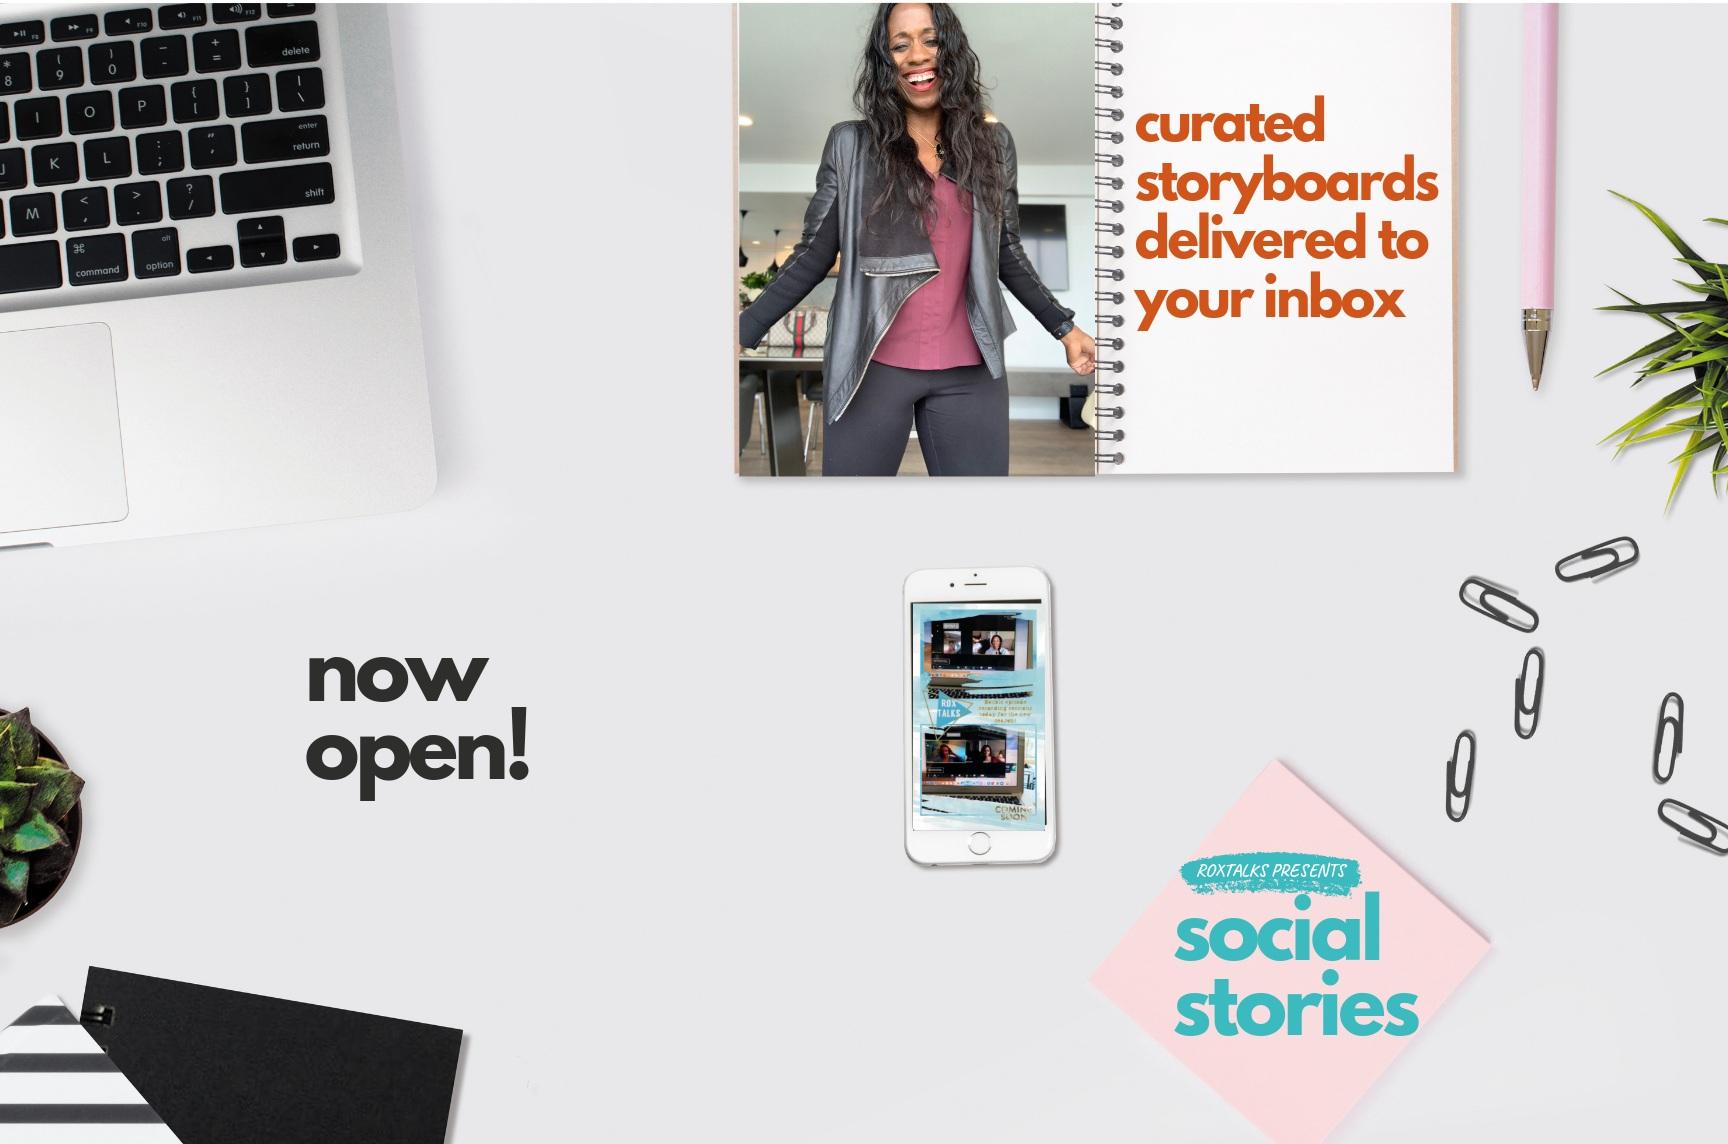 social+stories+3.jpg